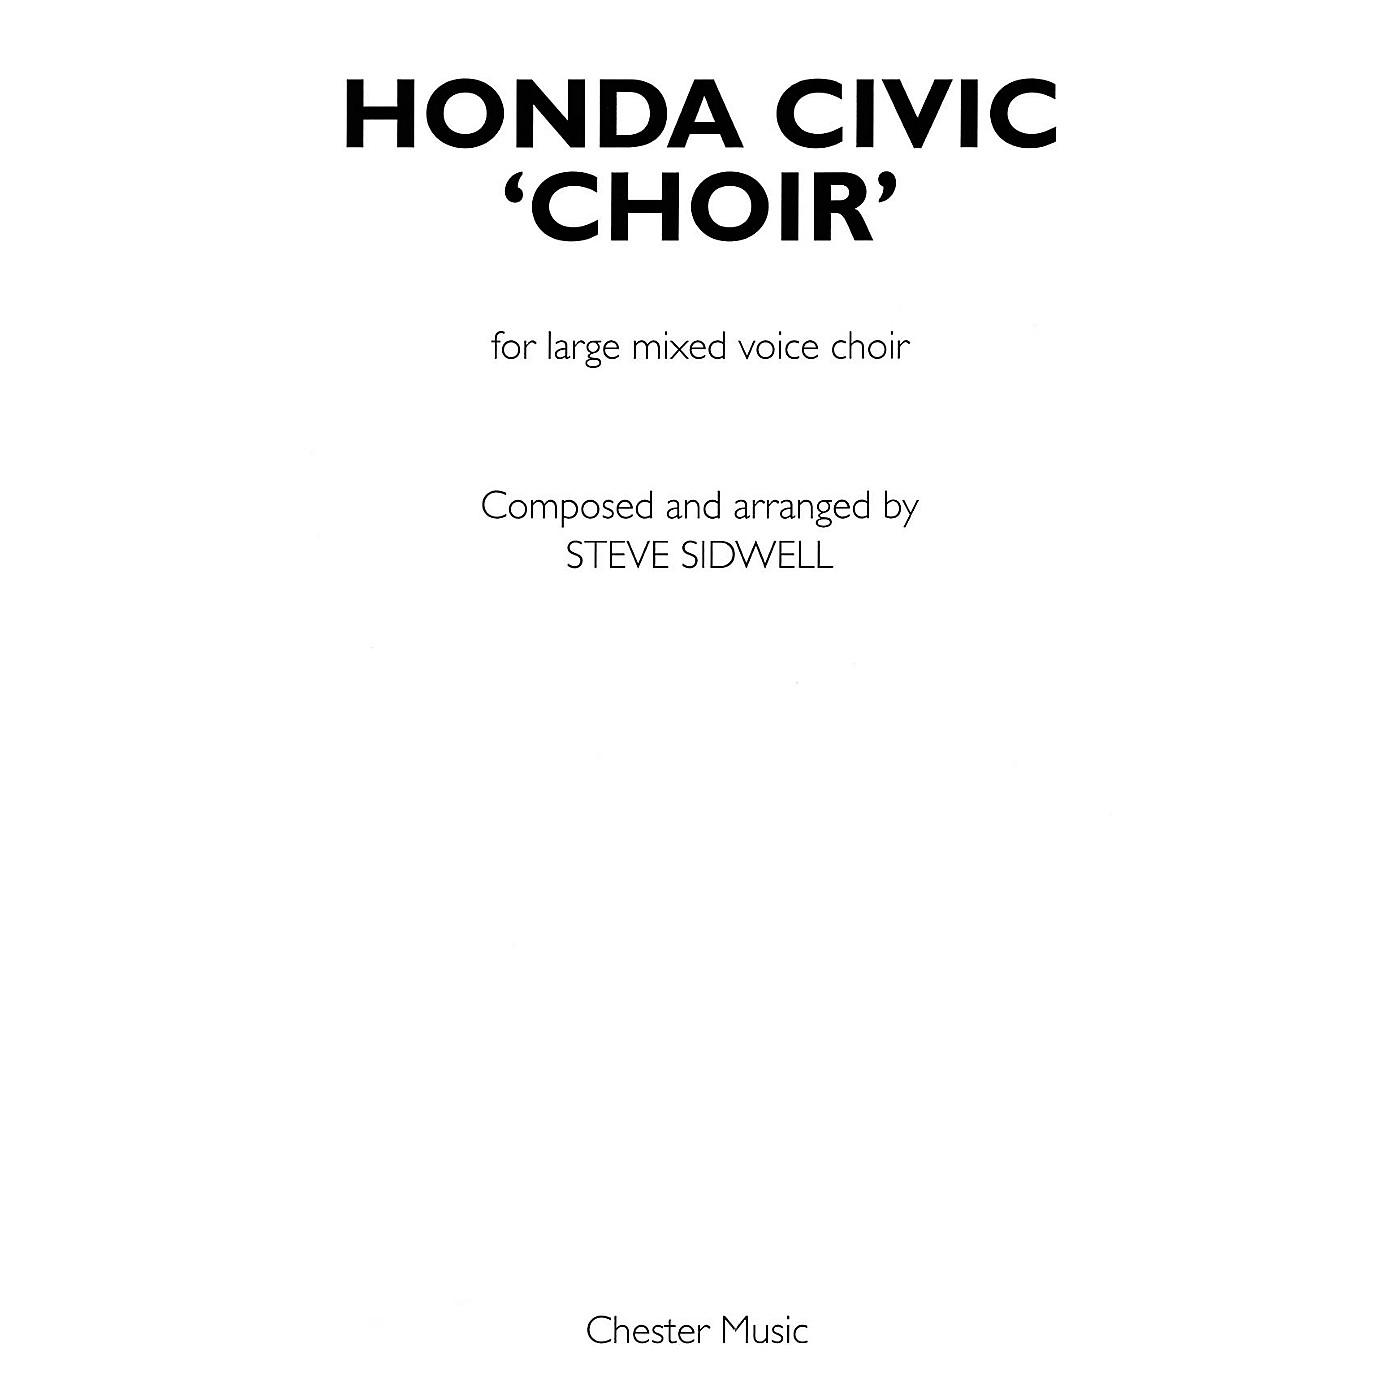 Chester Music Honda Civic Choir (Large Mixed Voice Choir) SATB Composed by Steve Sidwell thumbnail